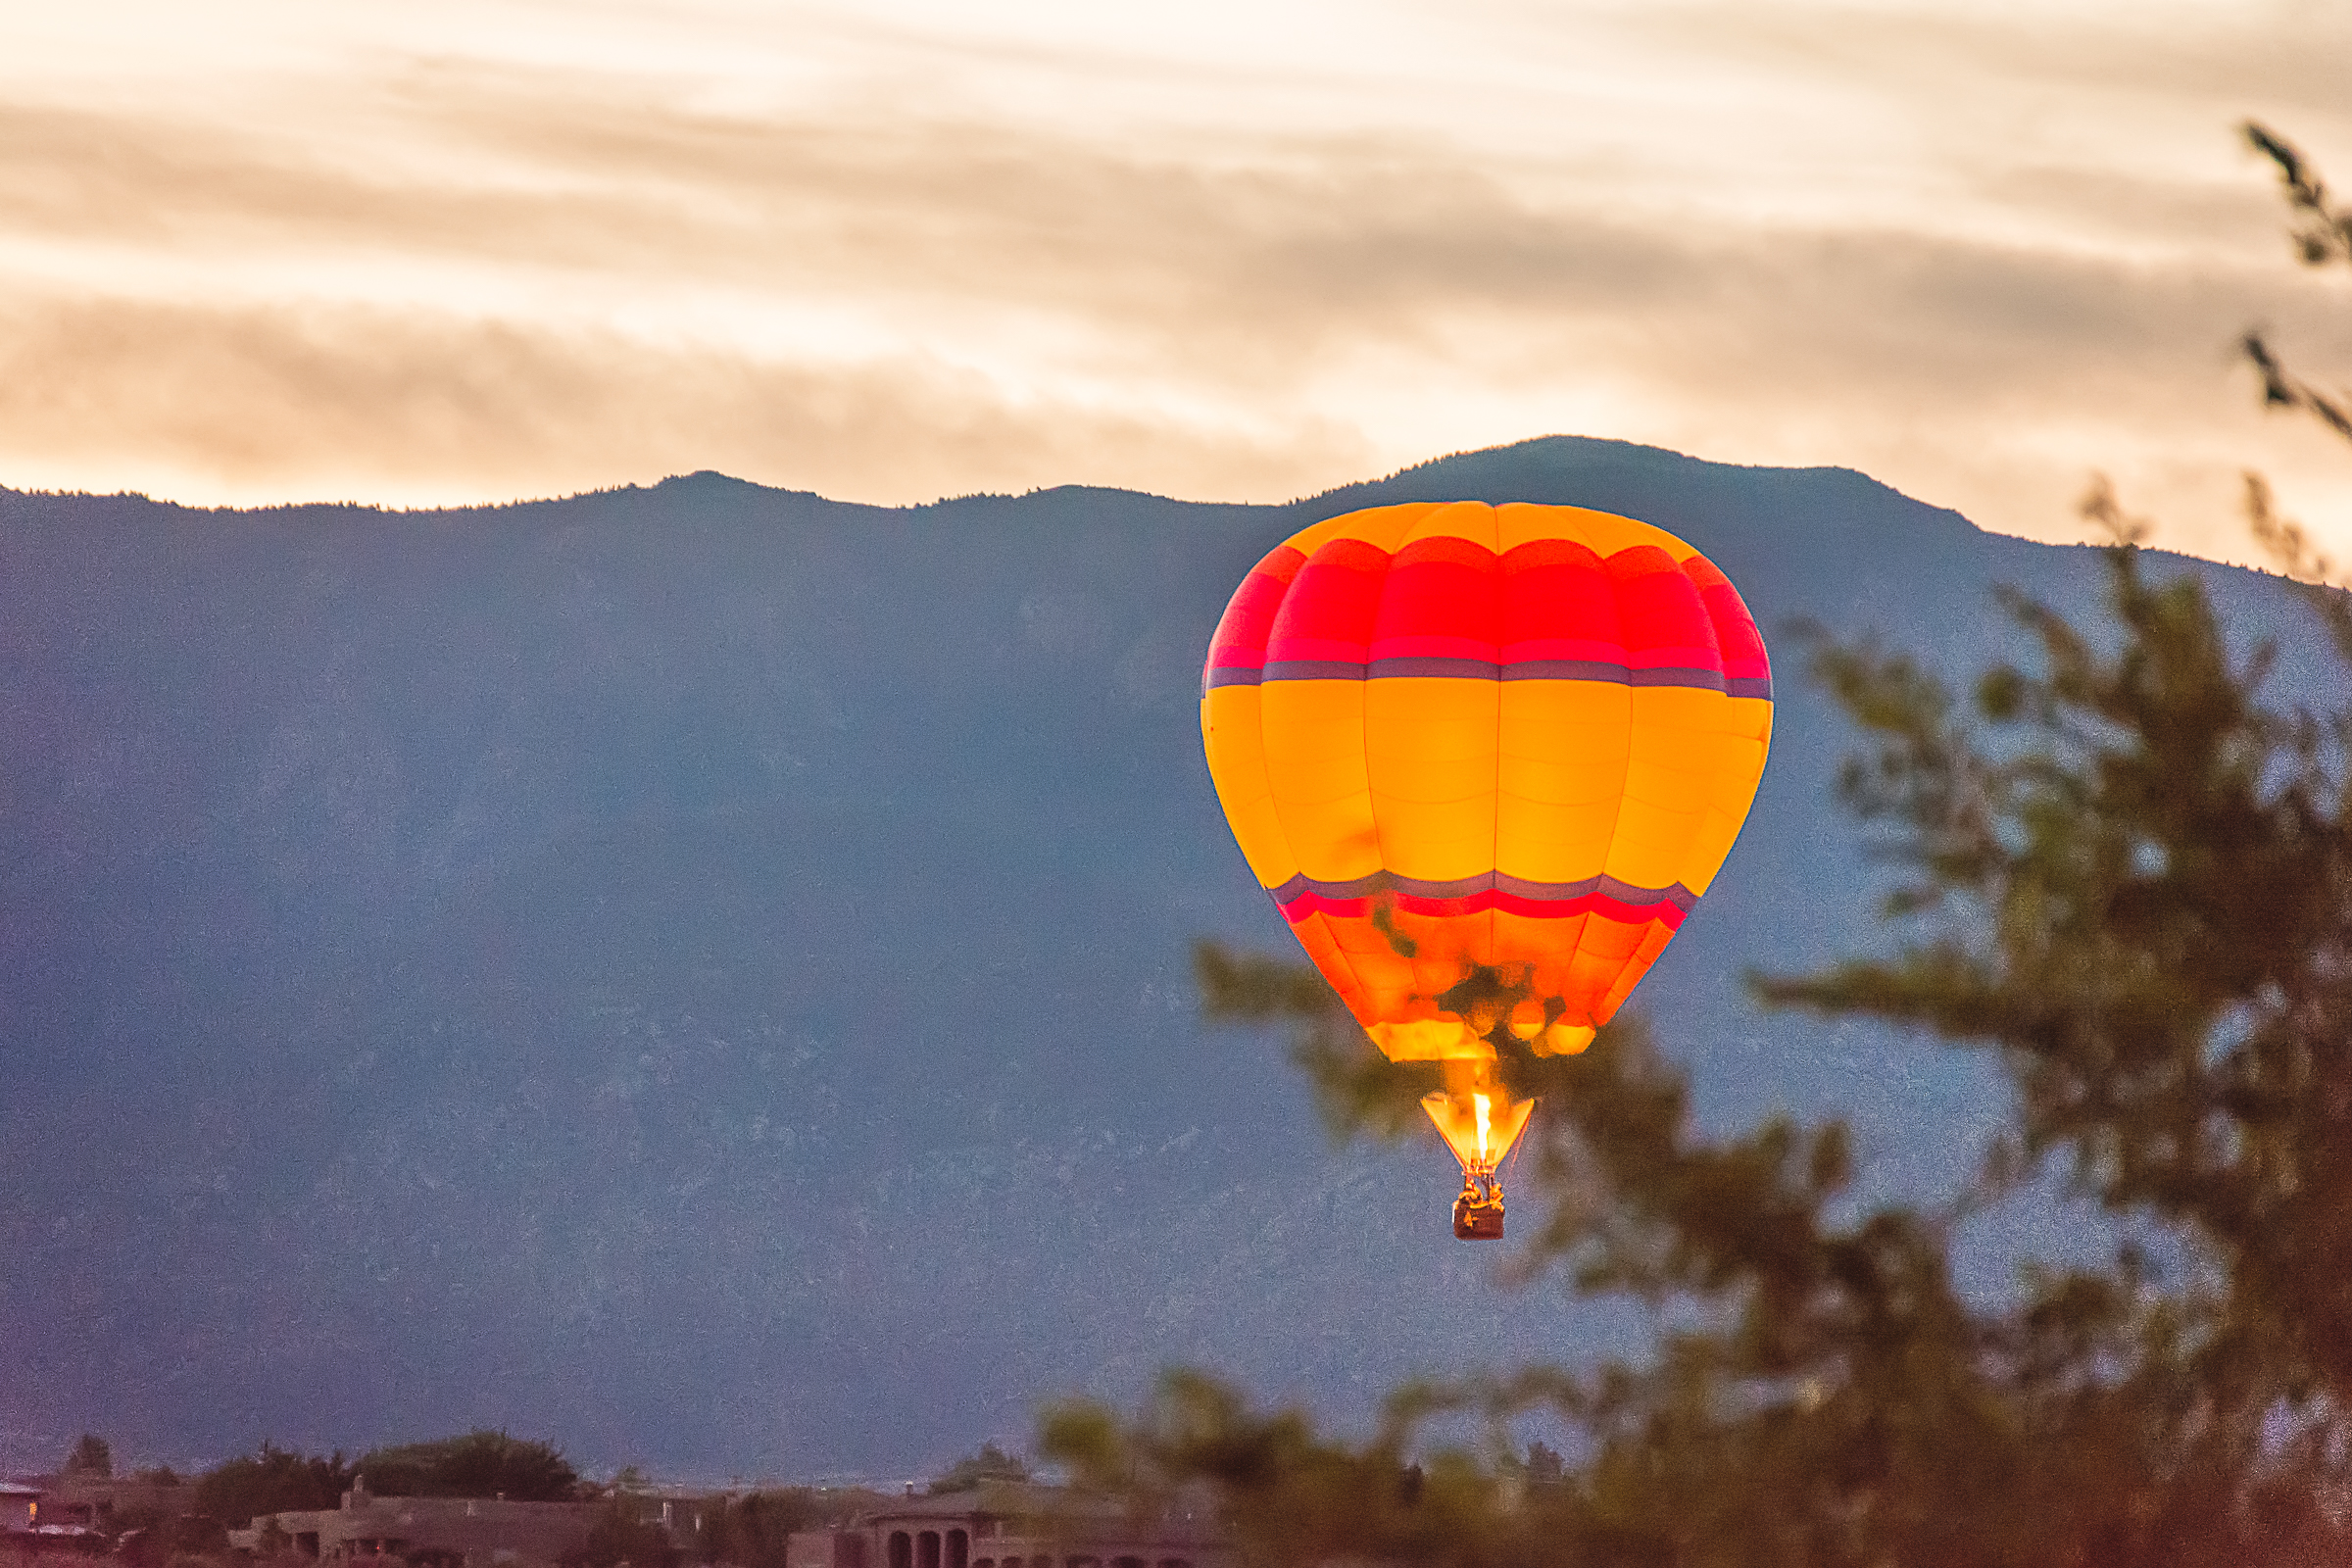 Hot Air Balloon, Hot Air Balloon and Mountains, Hot Air Balloon at Dawn, Albuquerque Photographer, Albuquerque International Balloon Fiesta